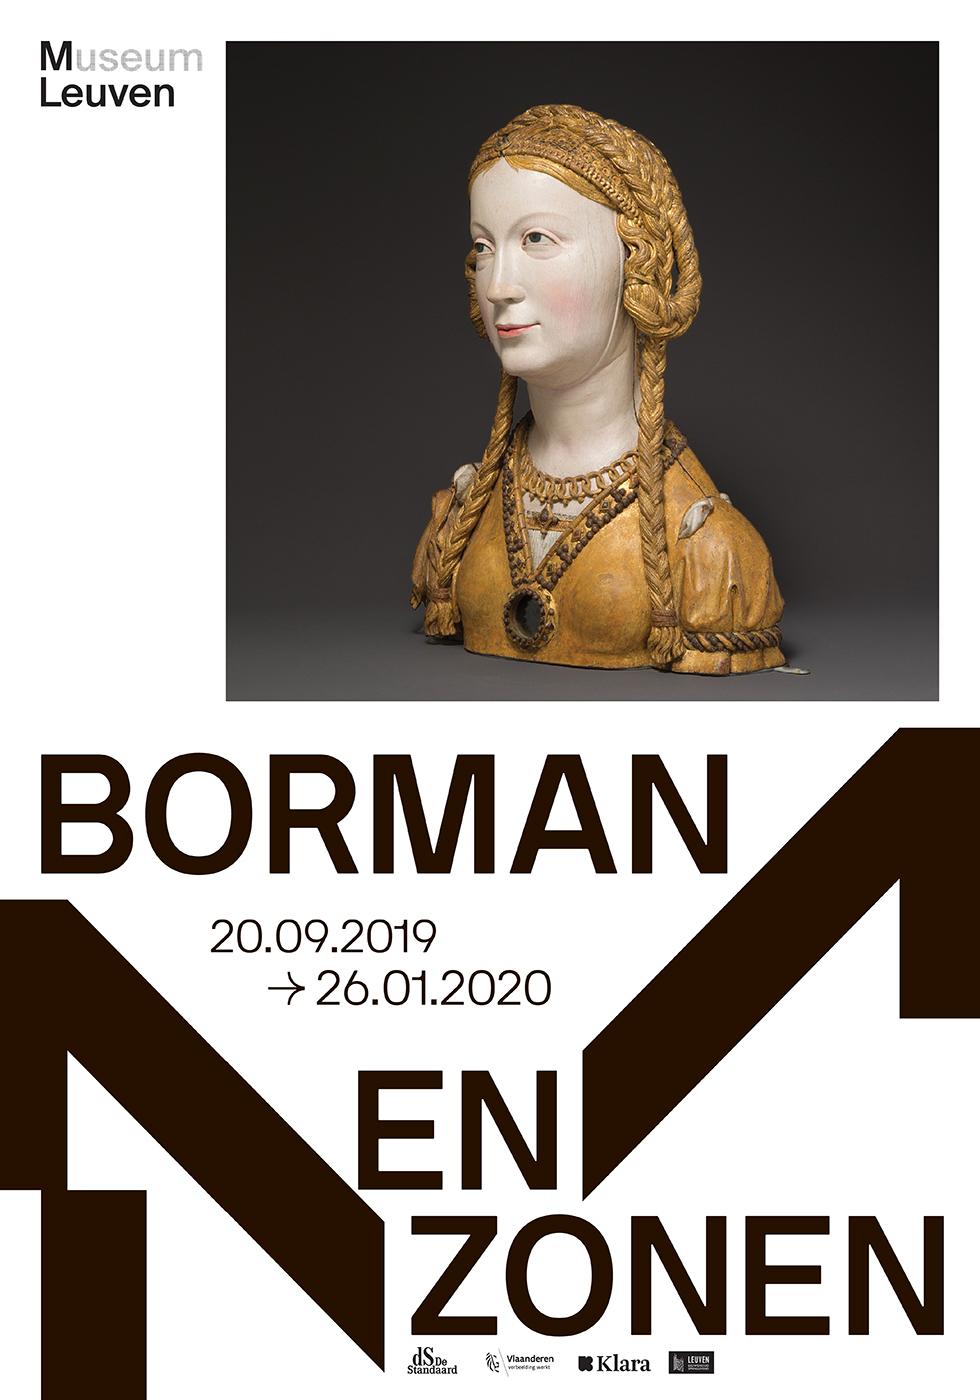 02-MuseumLeuven-02